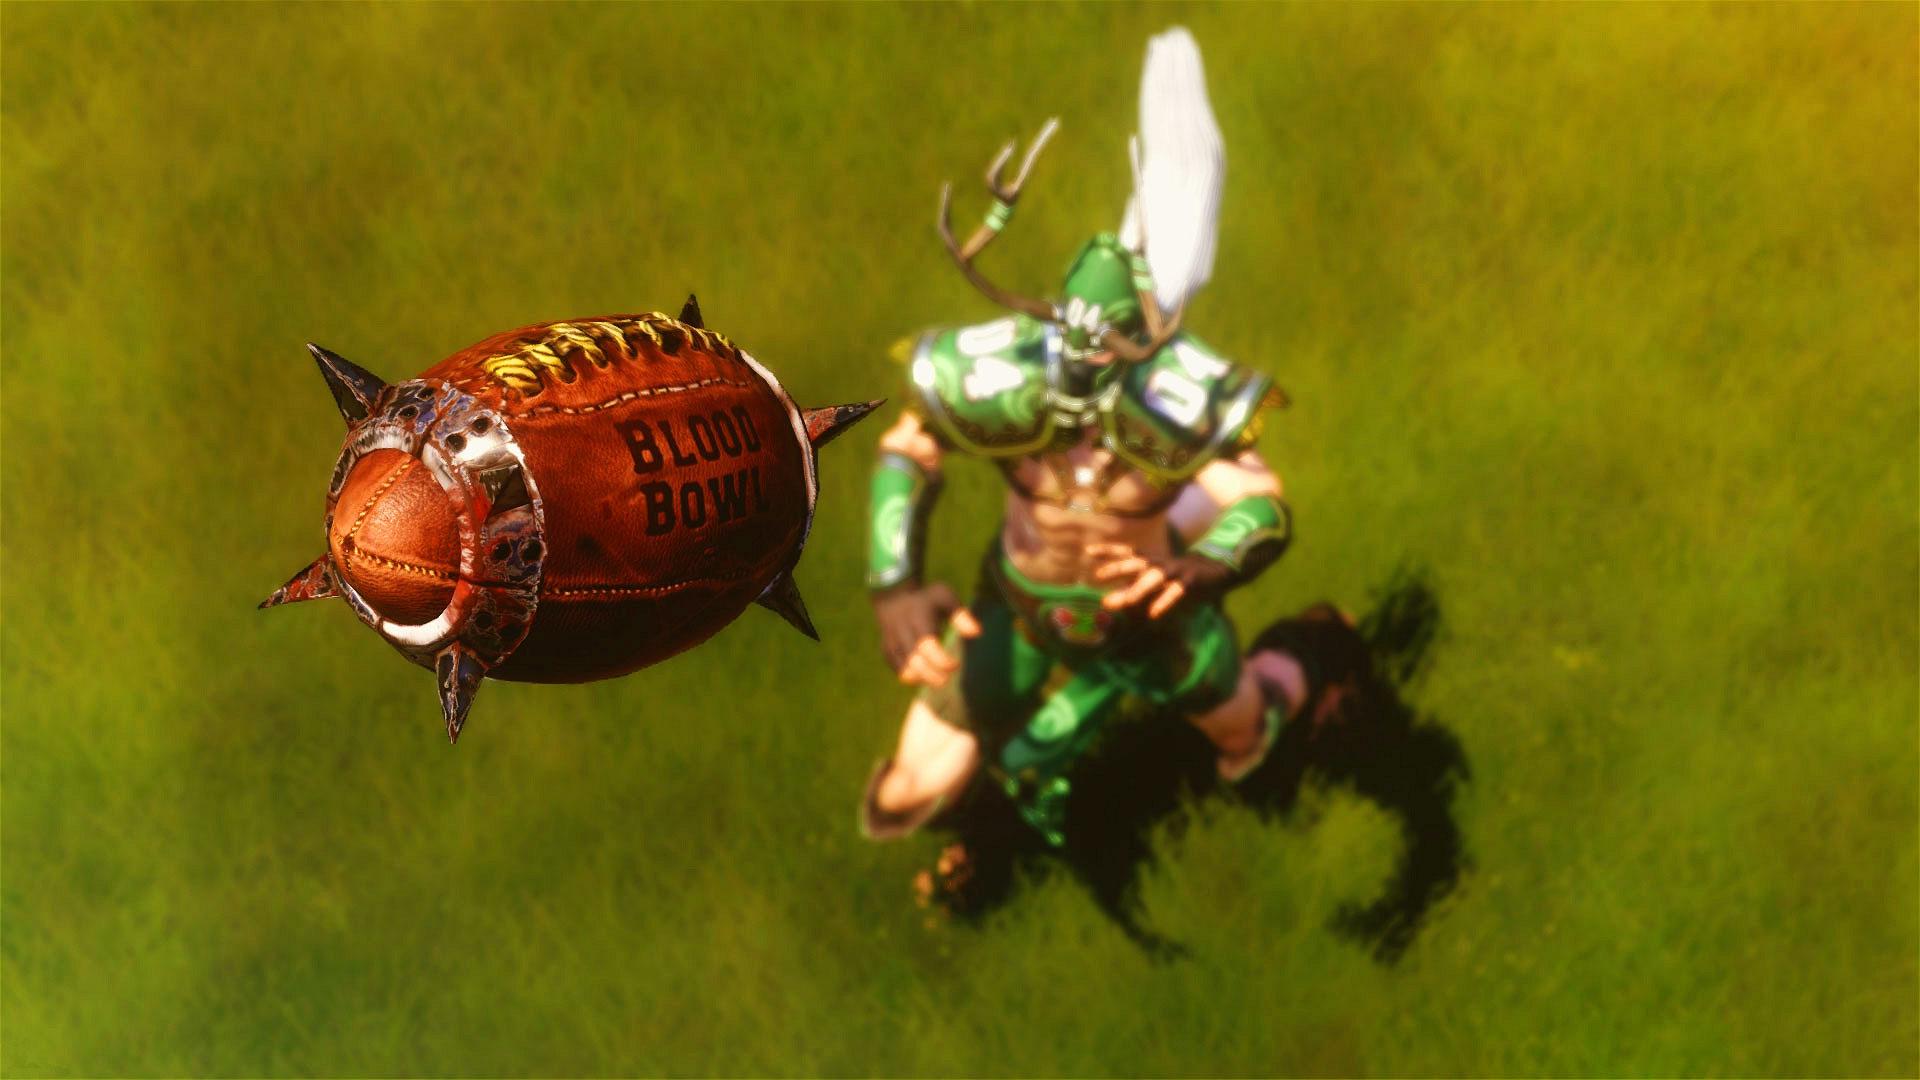 Blood Bowl 2 - Wood Elves screenshot